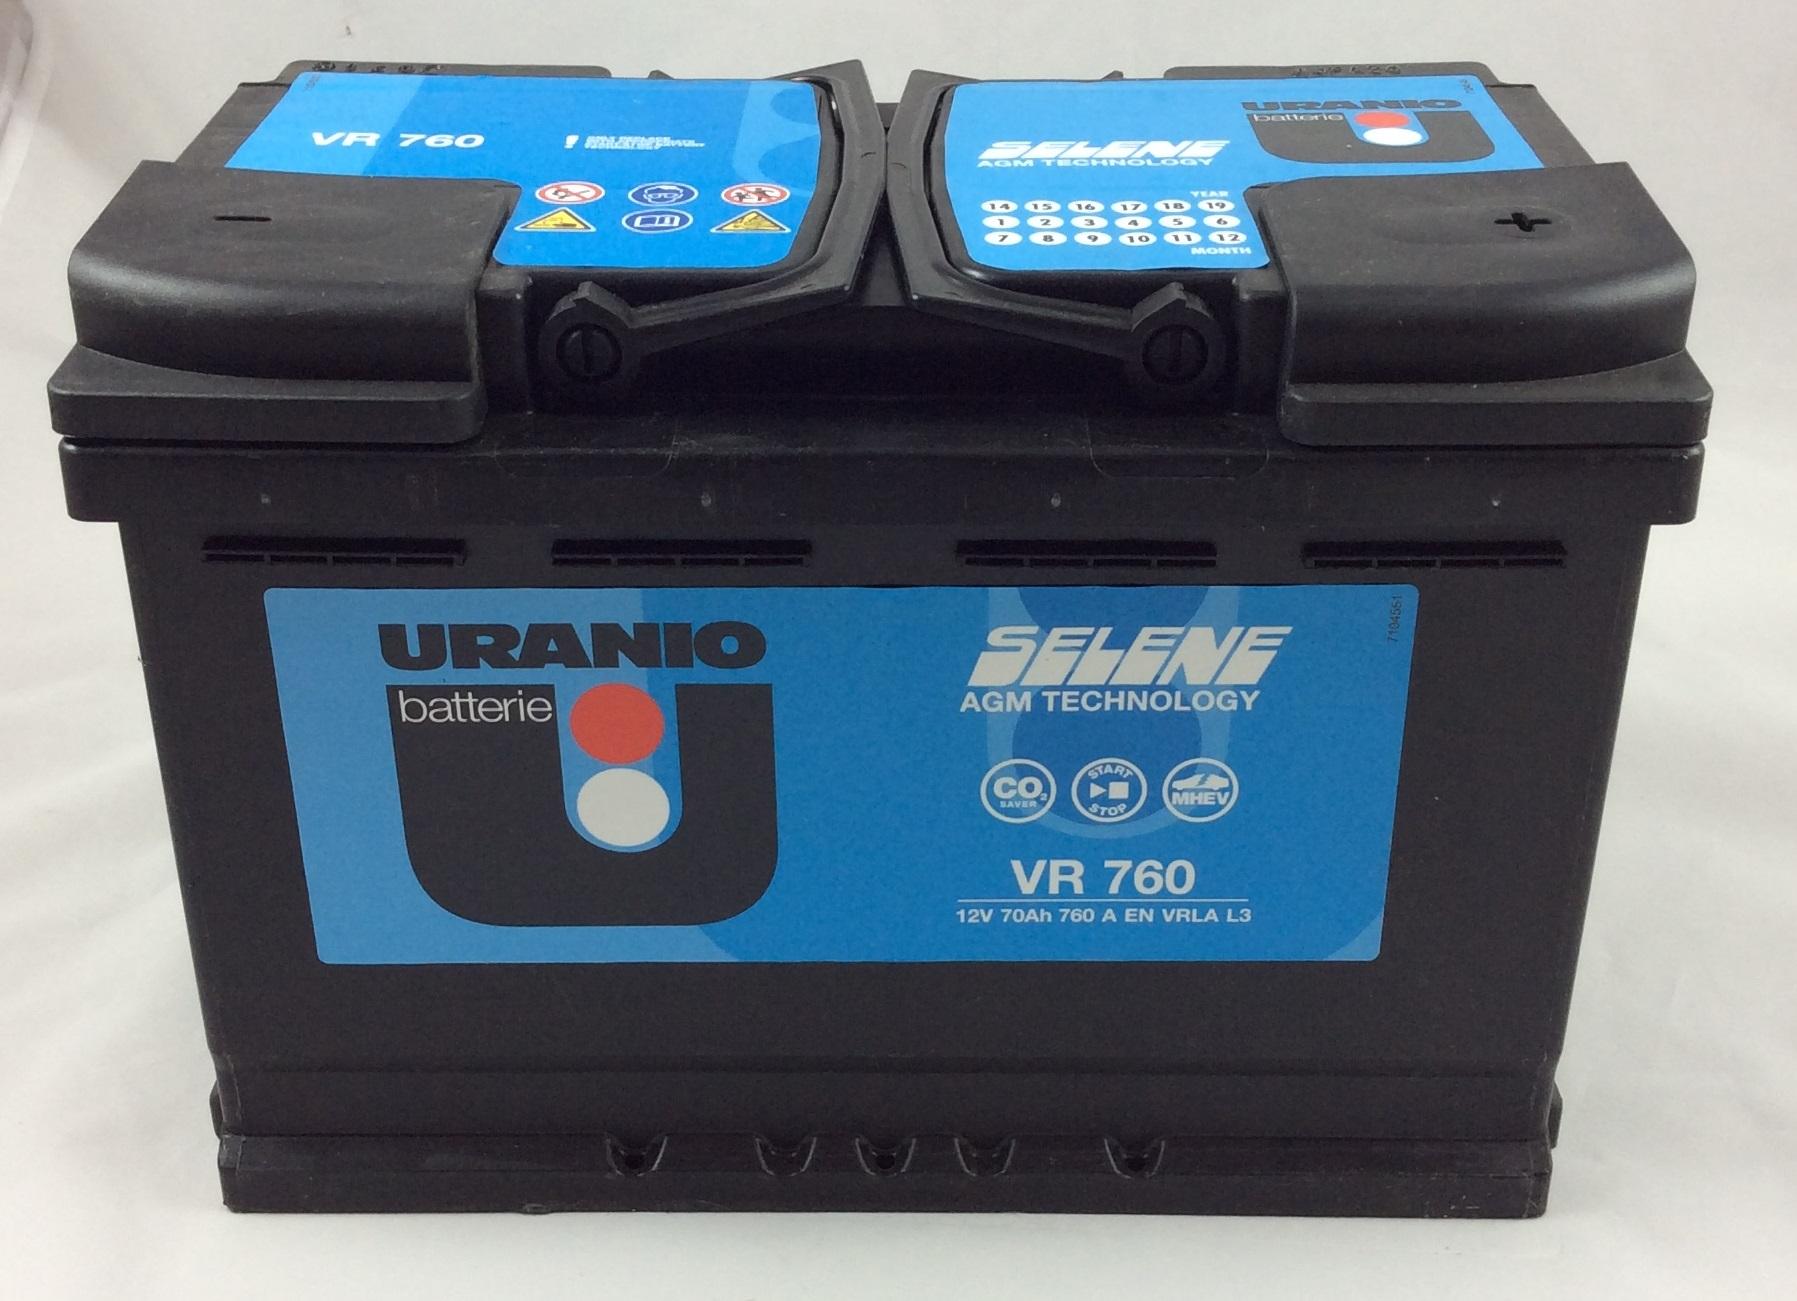 batteria uranio start e stop 12v 70ah 760a en vr760 sos battery vendita batterie online a. Black Bedroom Furniture Sets. Home Design Ideas